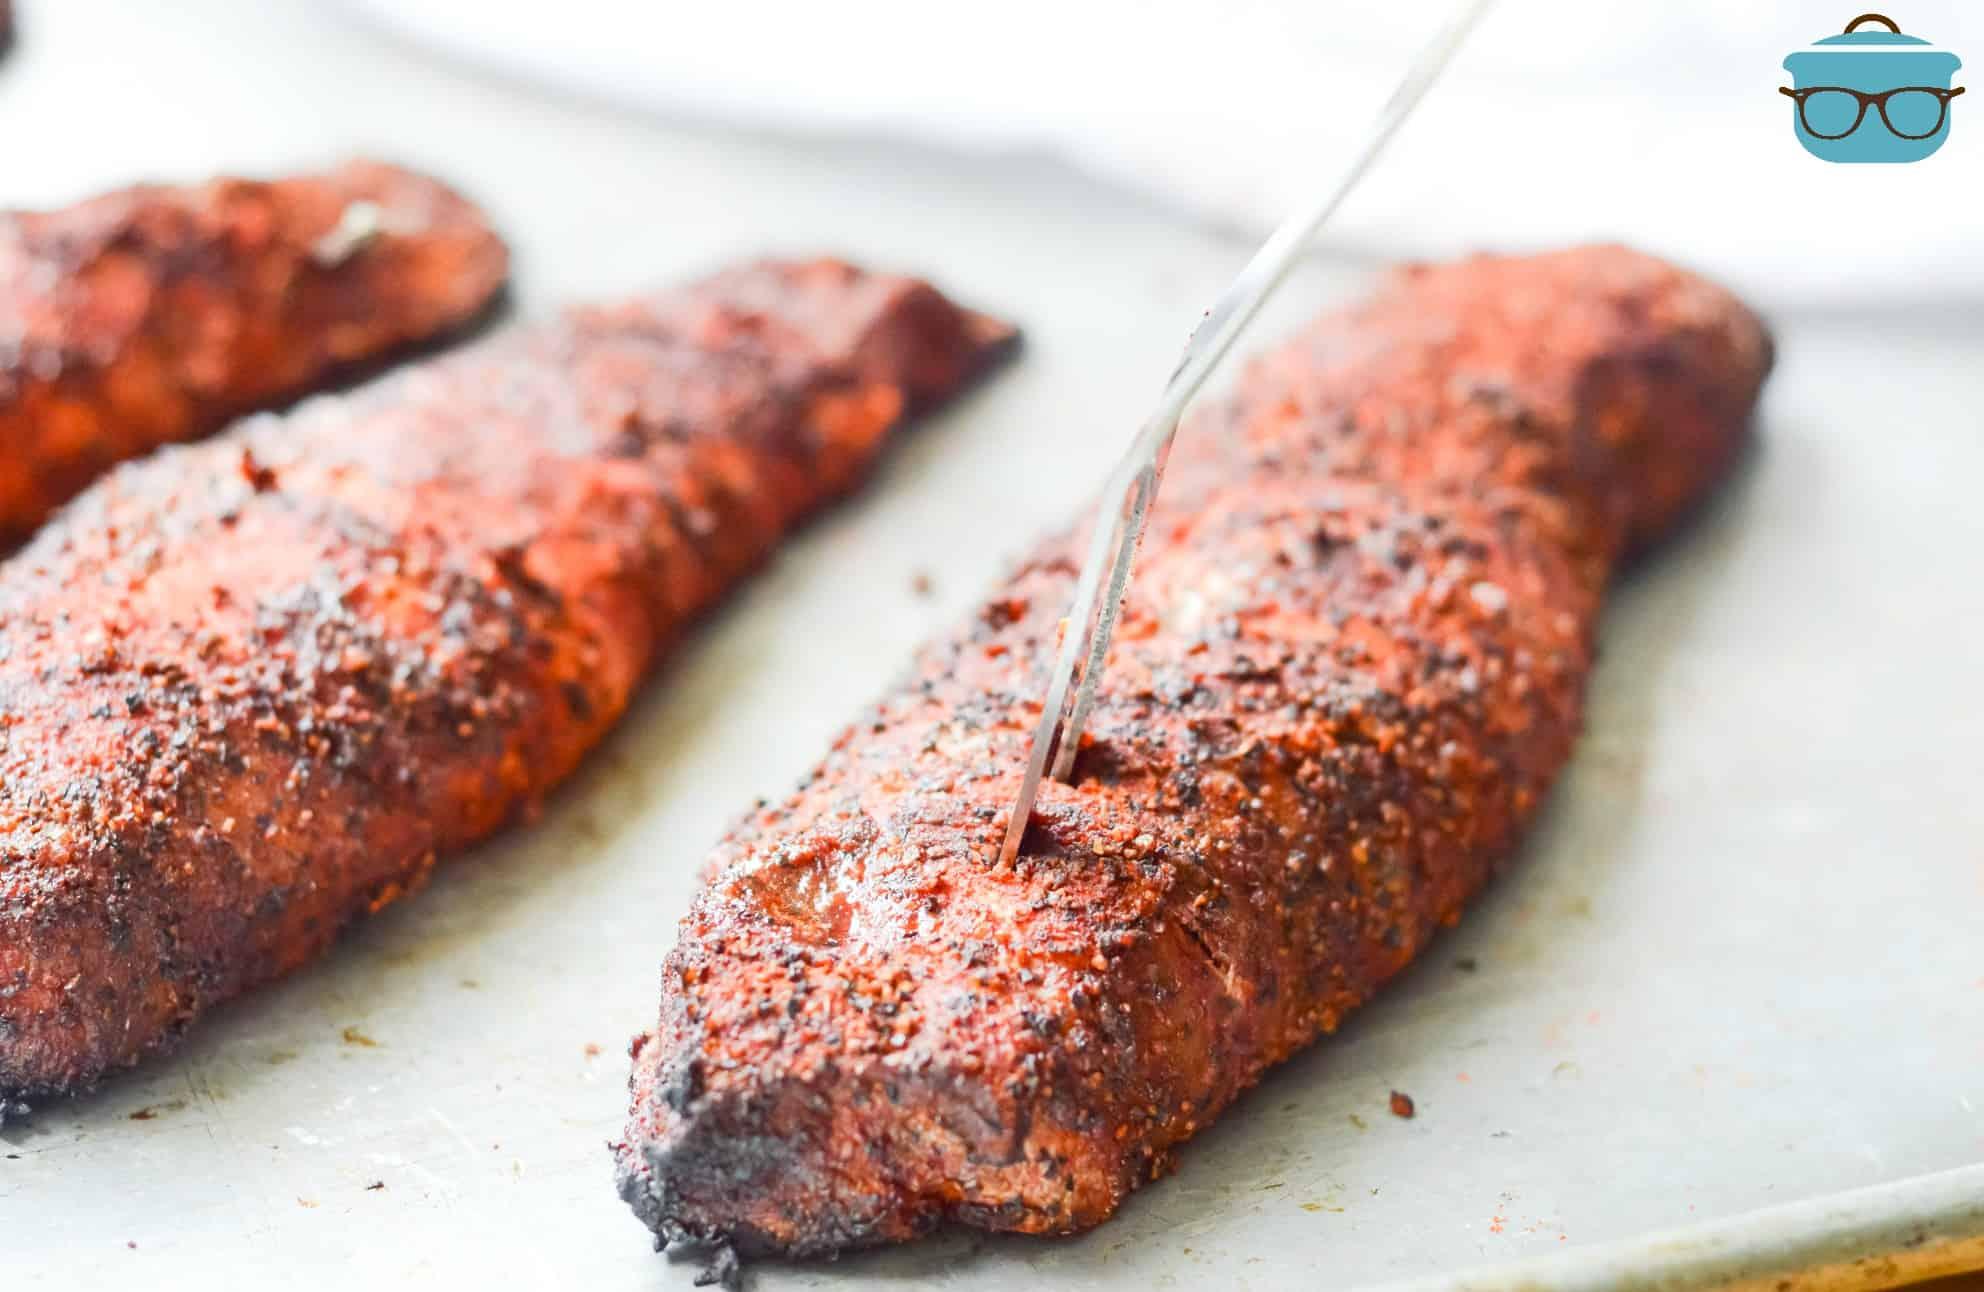 fully cooked smoked pork tenderloins on a metal baking sheet.